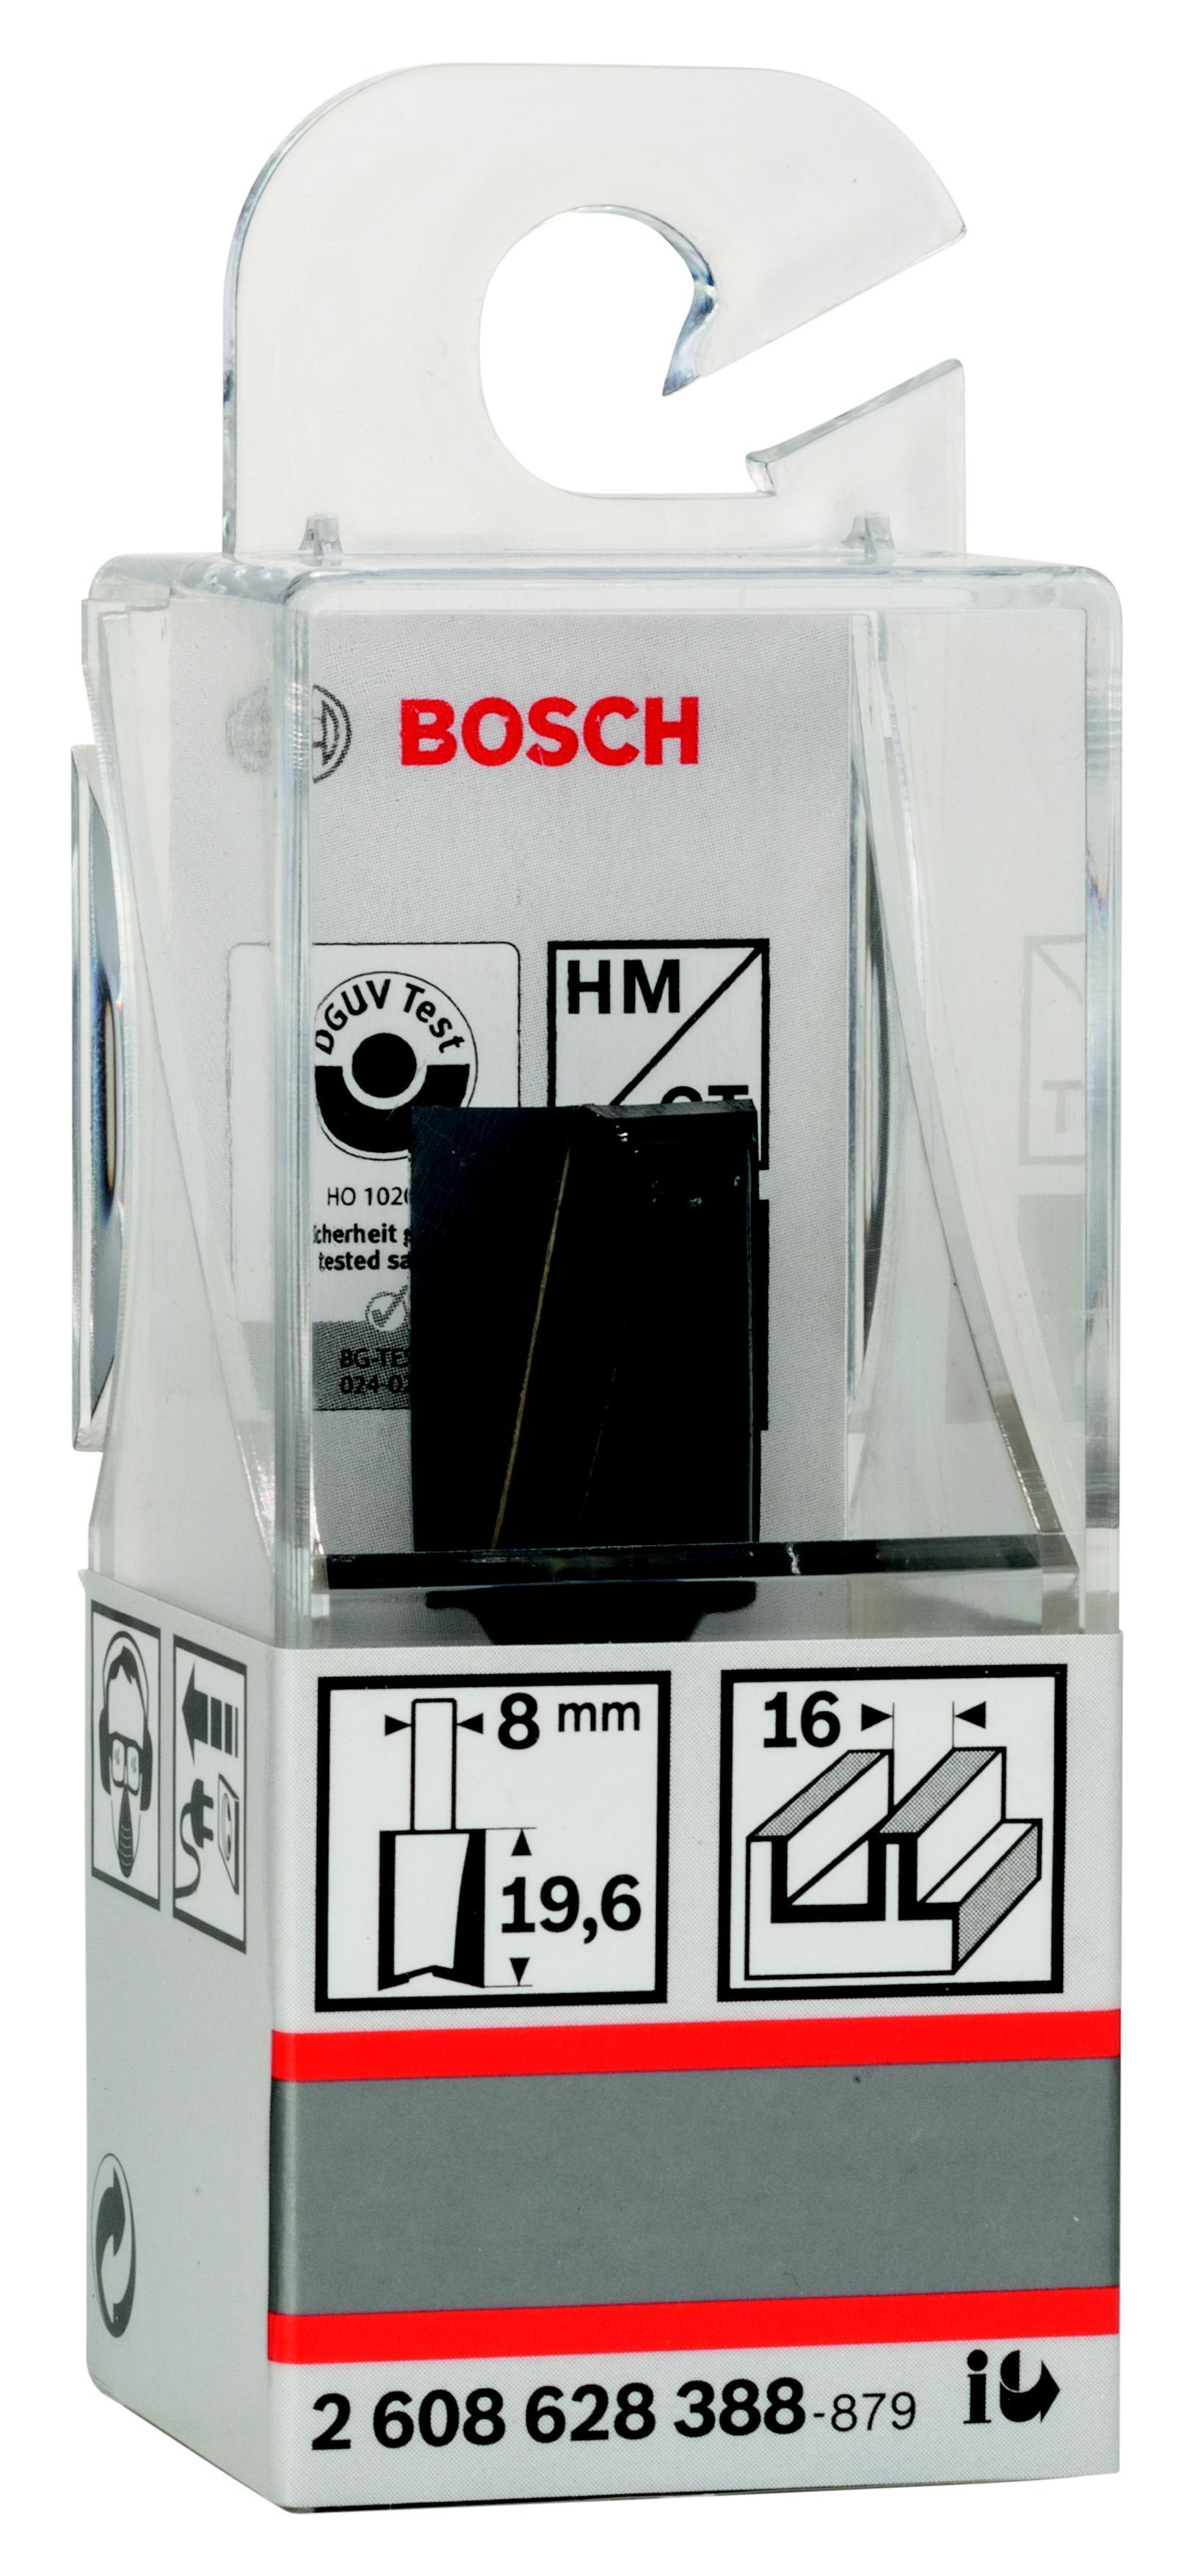 Фреза Bosch Ф16мм s8мм i20мм (2.608.628.388) фреза bosch ф16мм s8мм i12 7мм 2 608 628 369